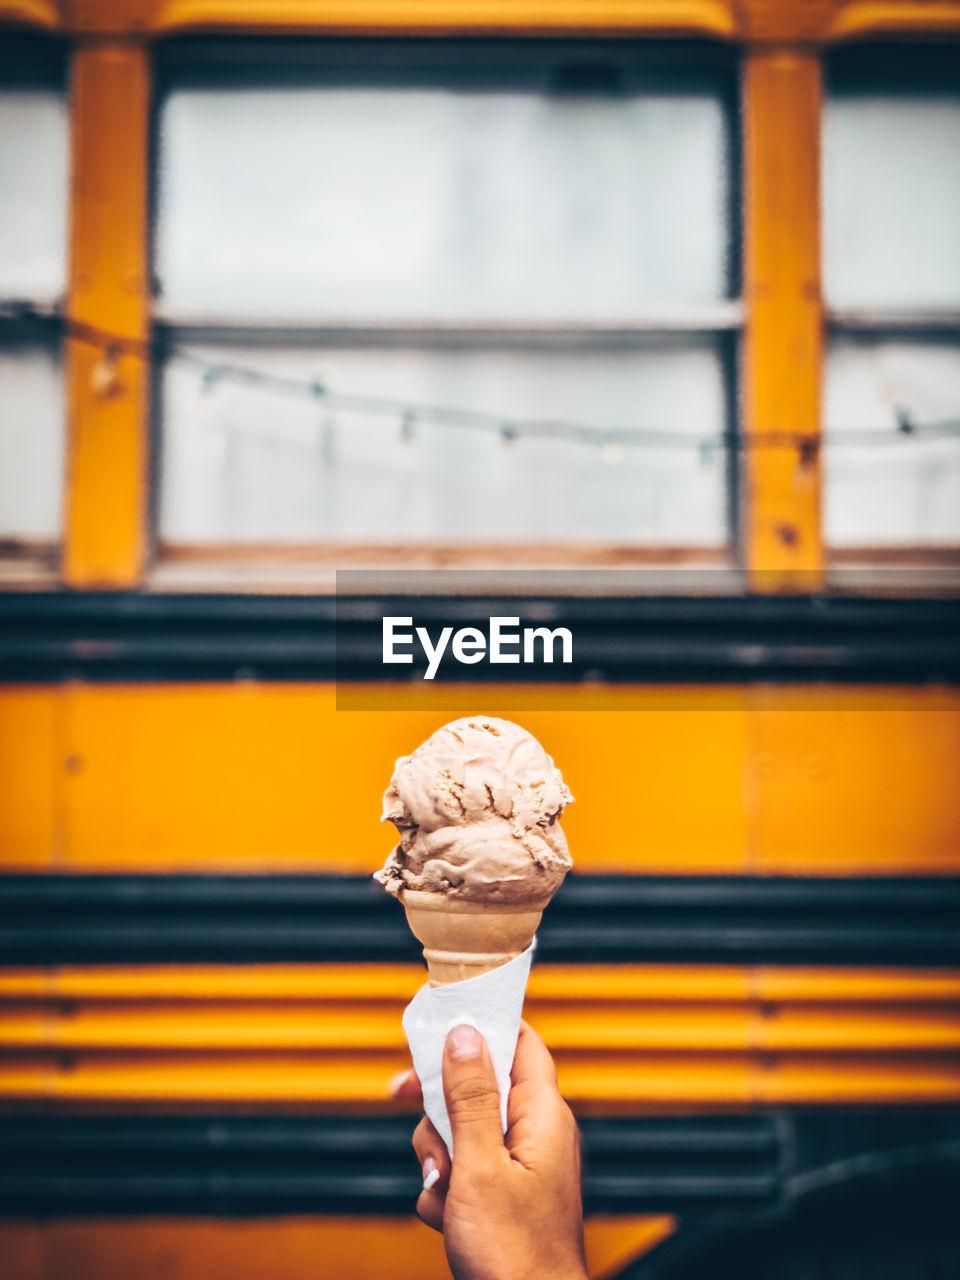 Human Hand Holding Ice Cream Against Bus